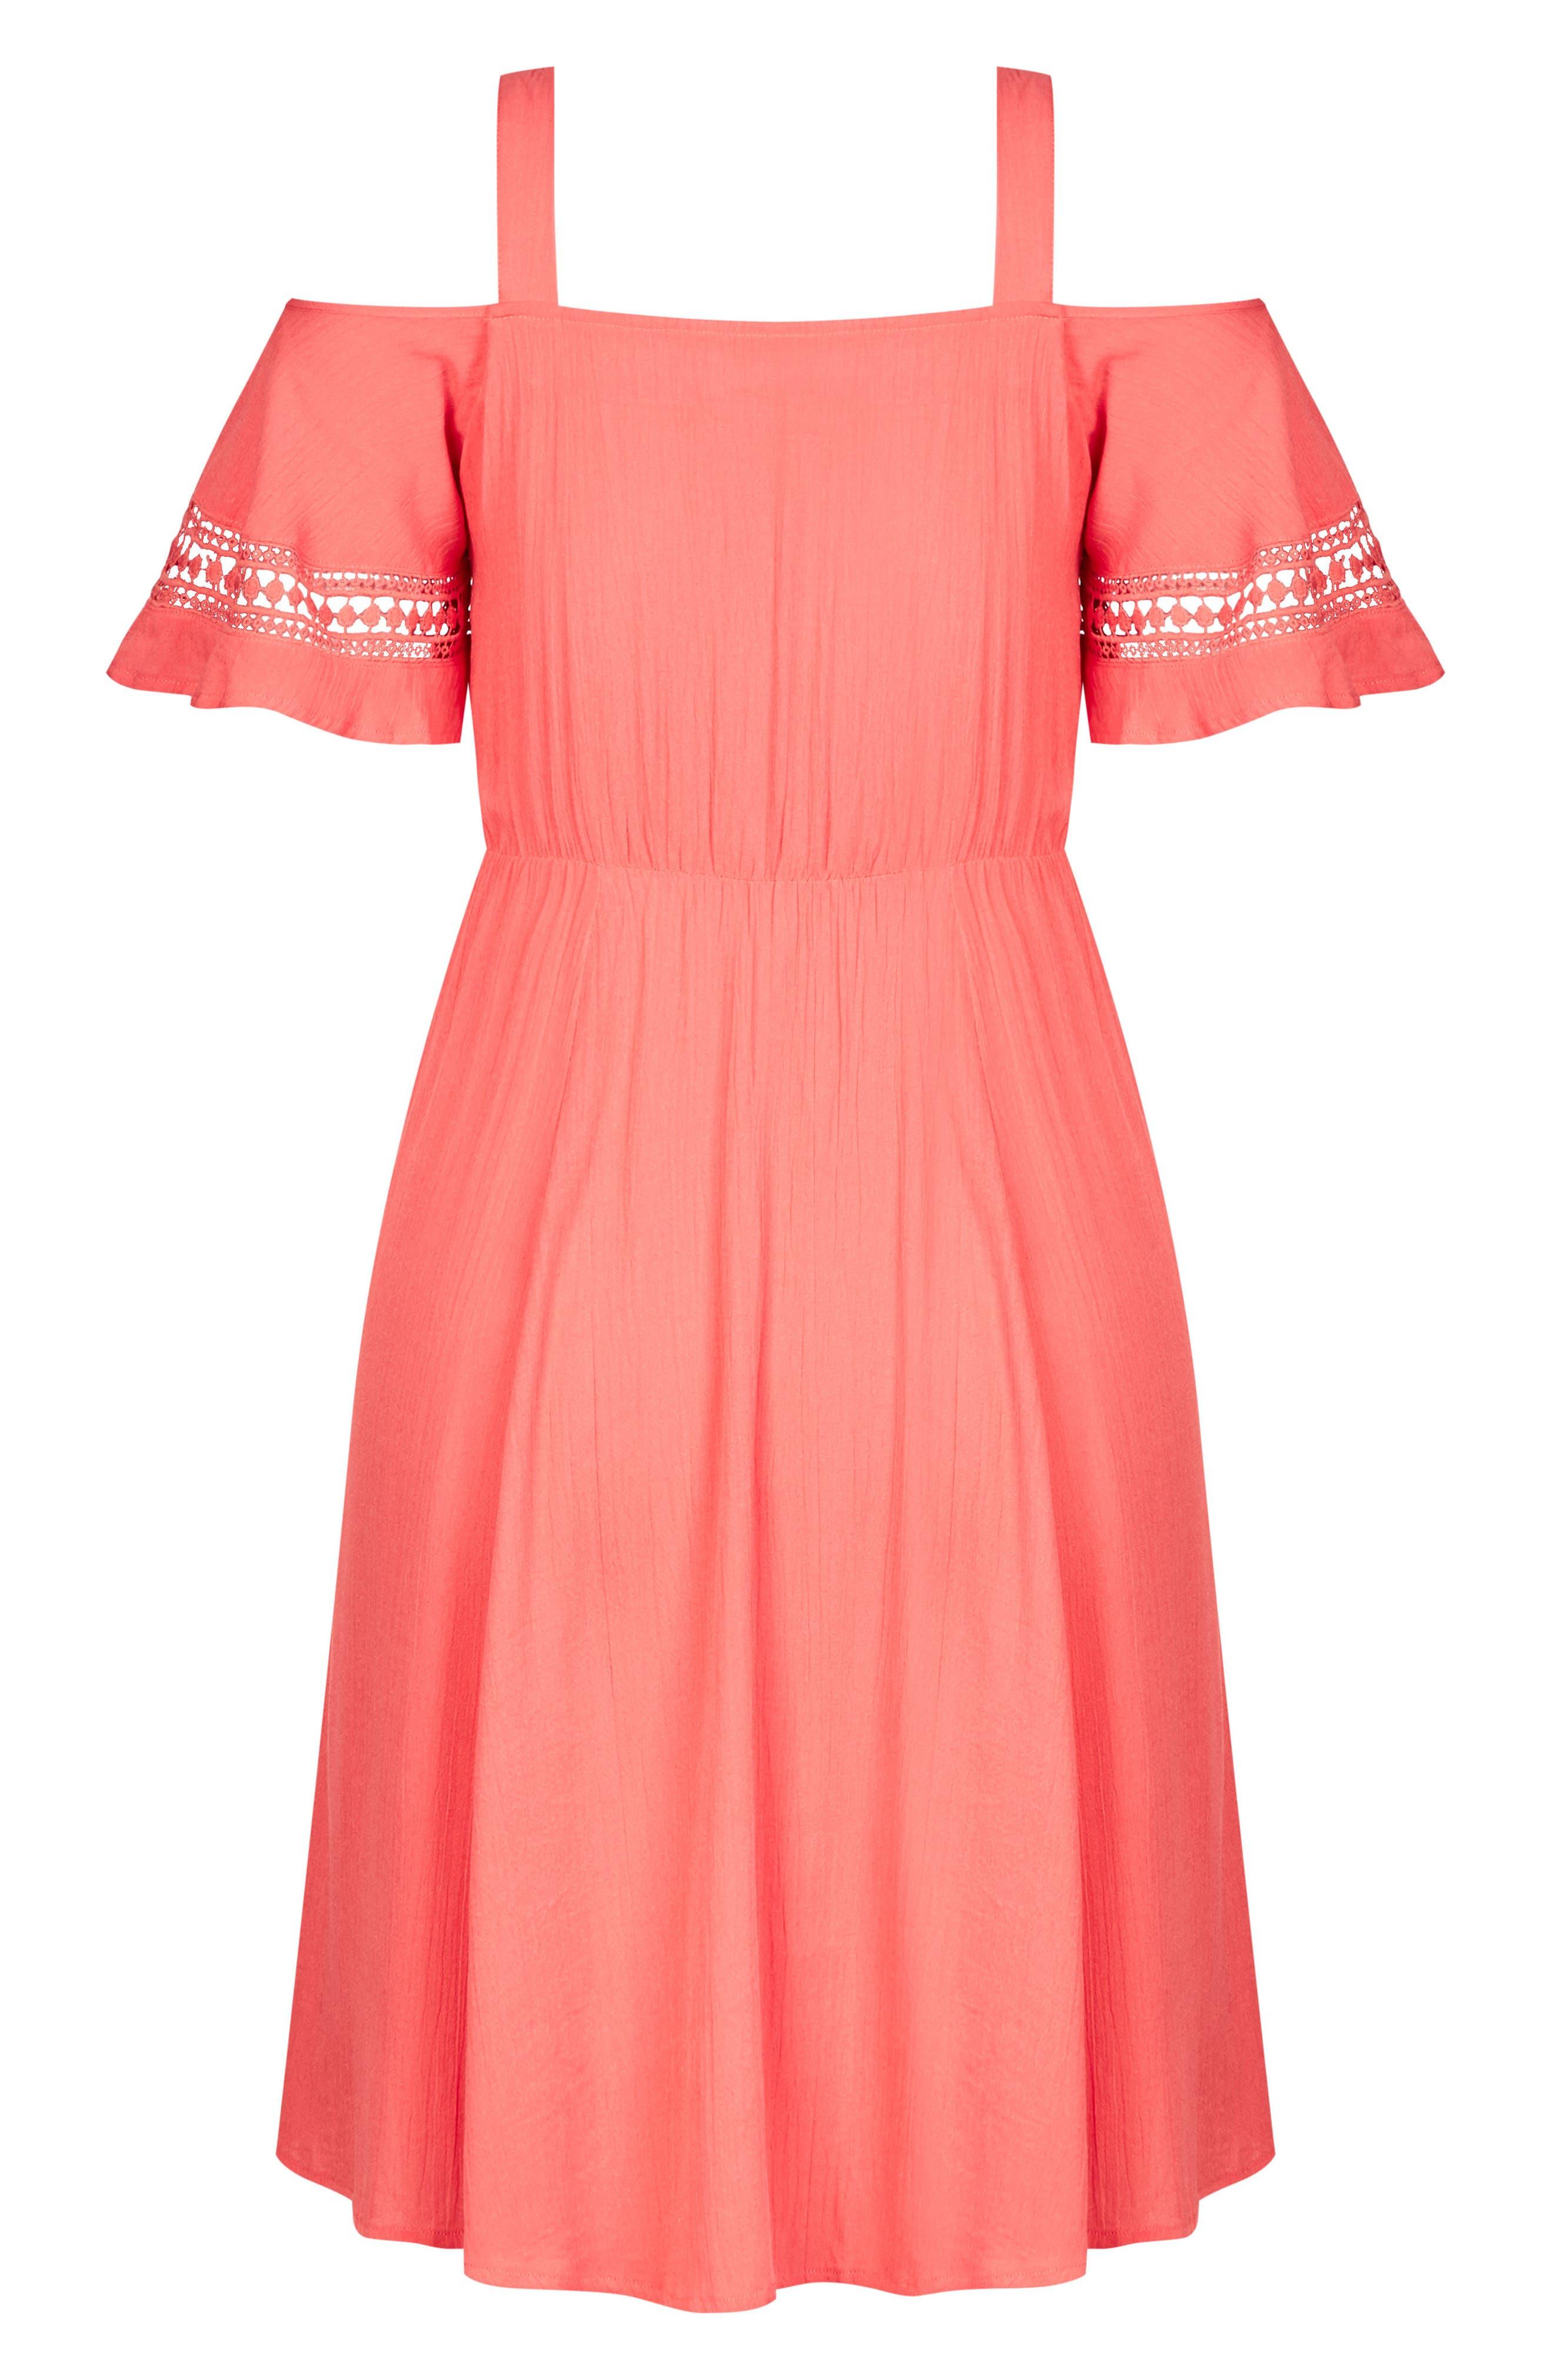 Sweet Frills Dress,                             Alternate thumbnail 3, color,                             Dark Coral